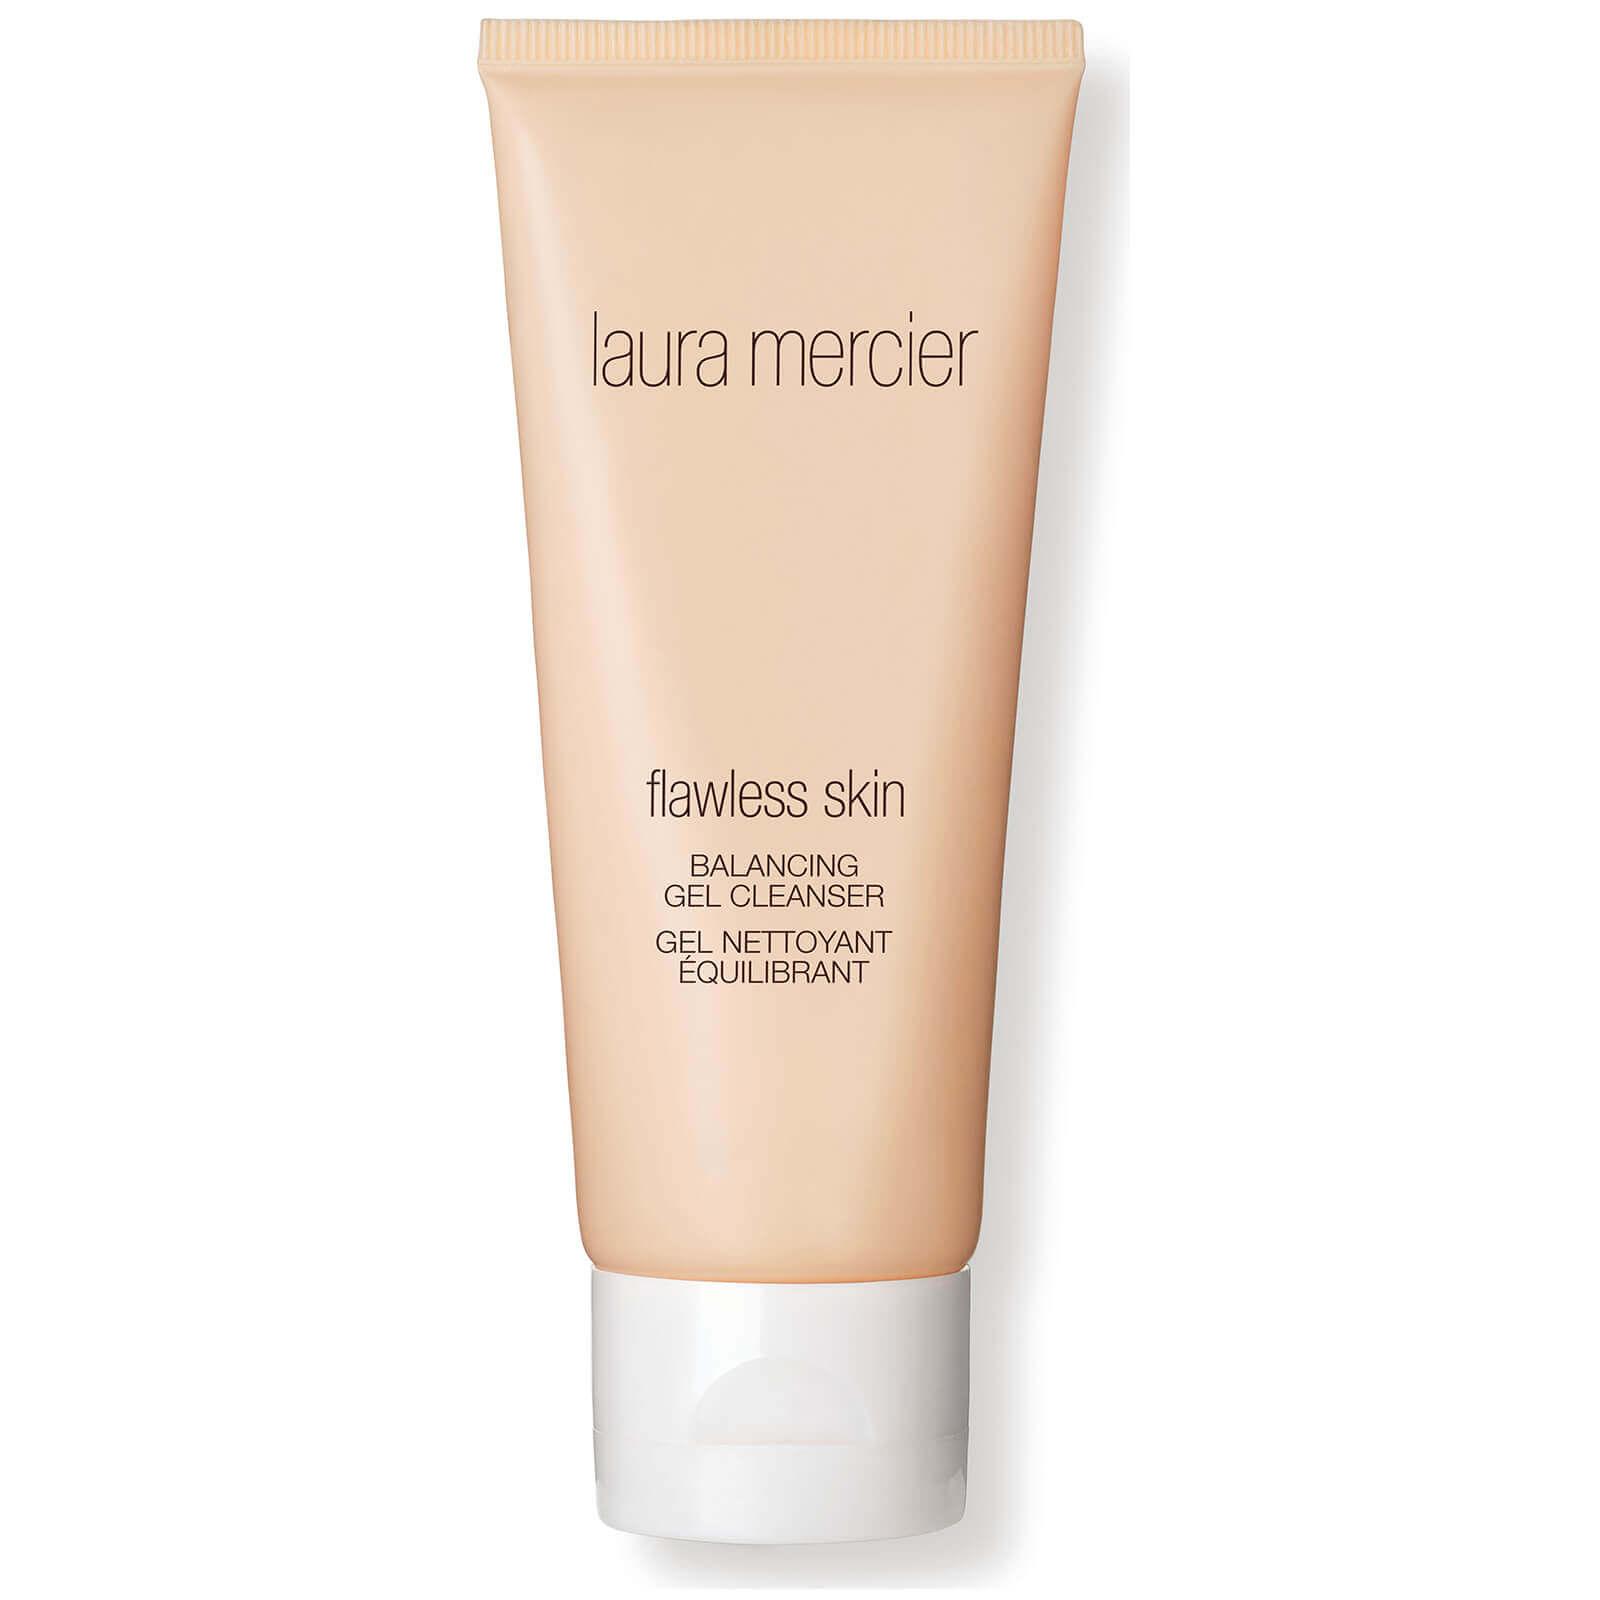 Laura Mercier Balancing Gel Cleanser 200ml